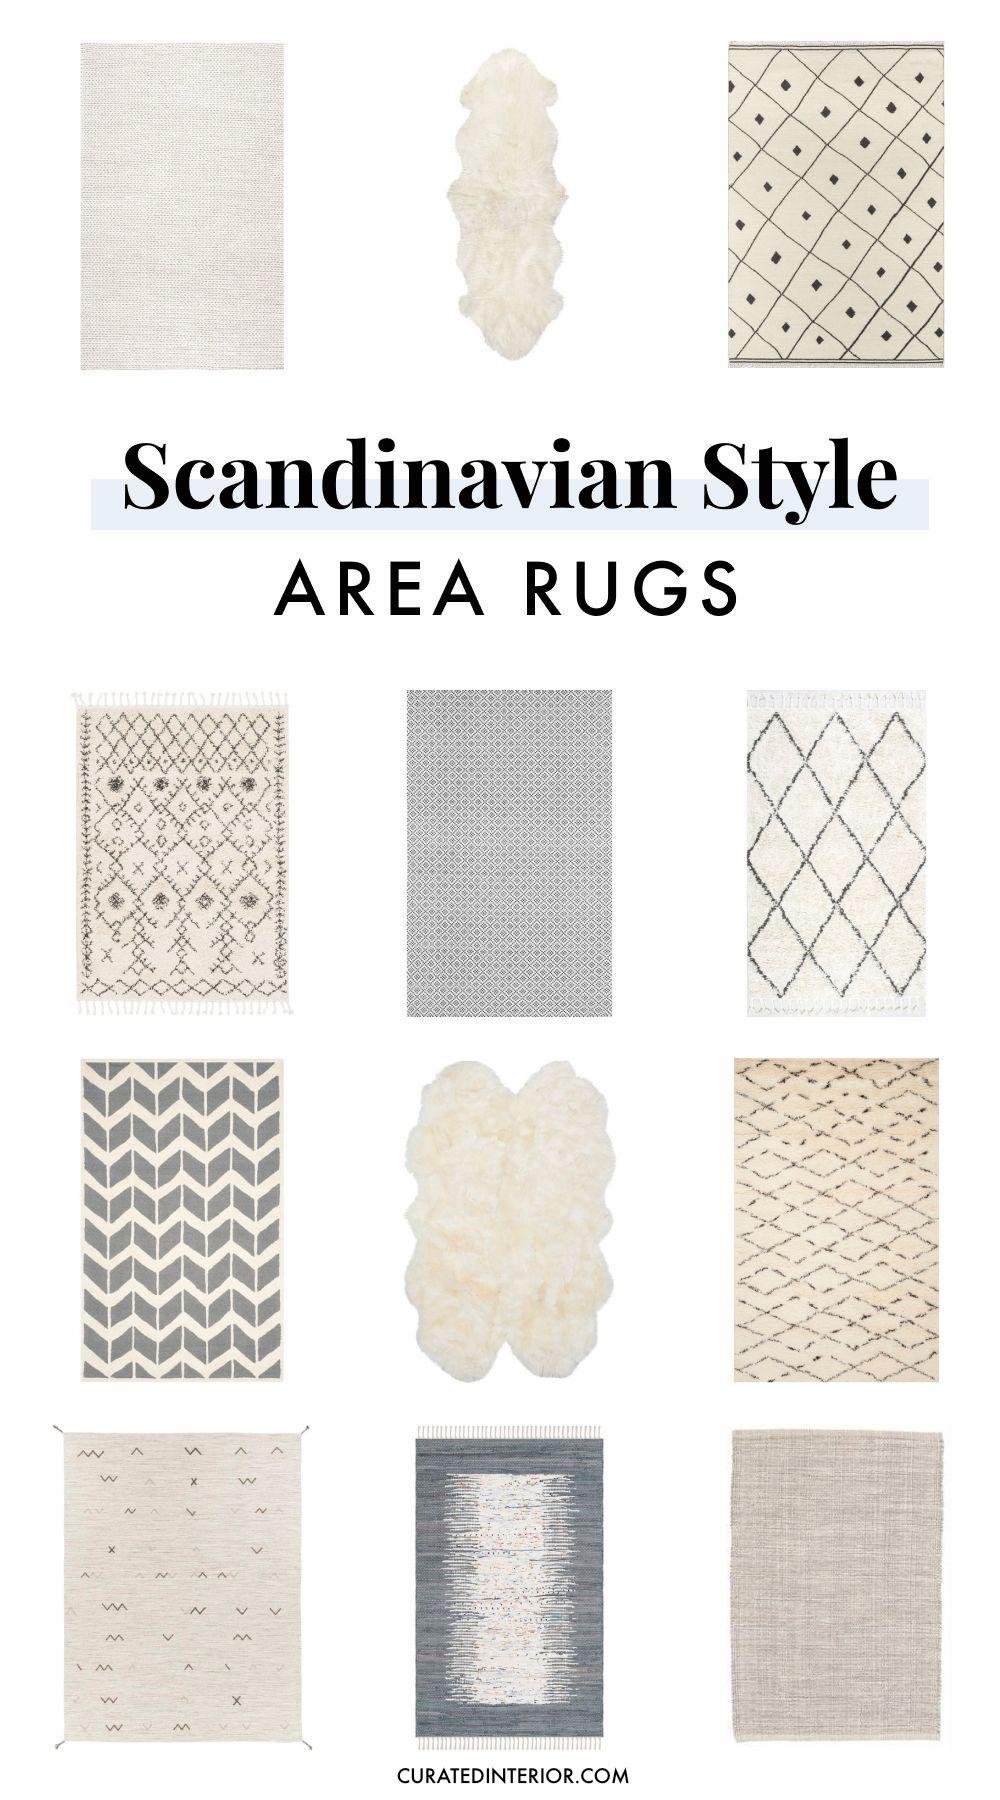 Scandinavian Style Area Rugs